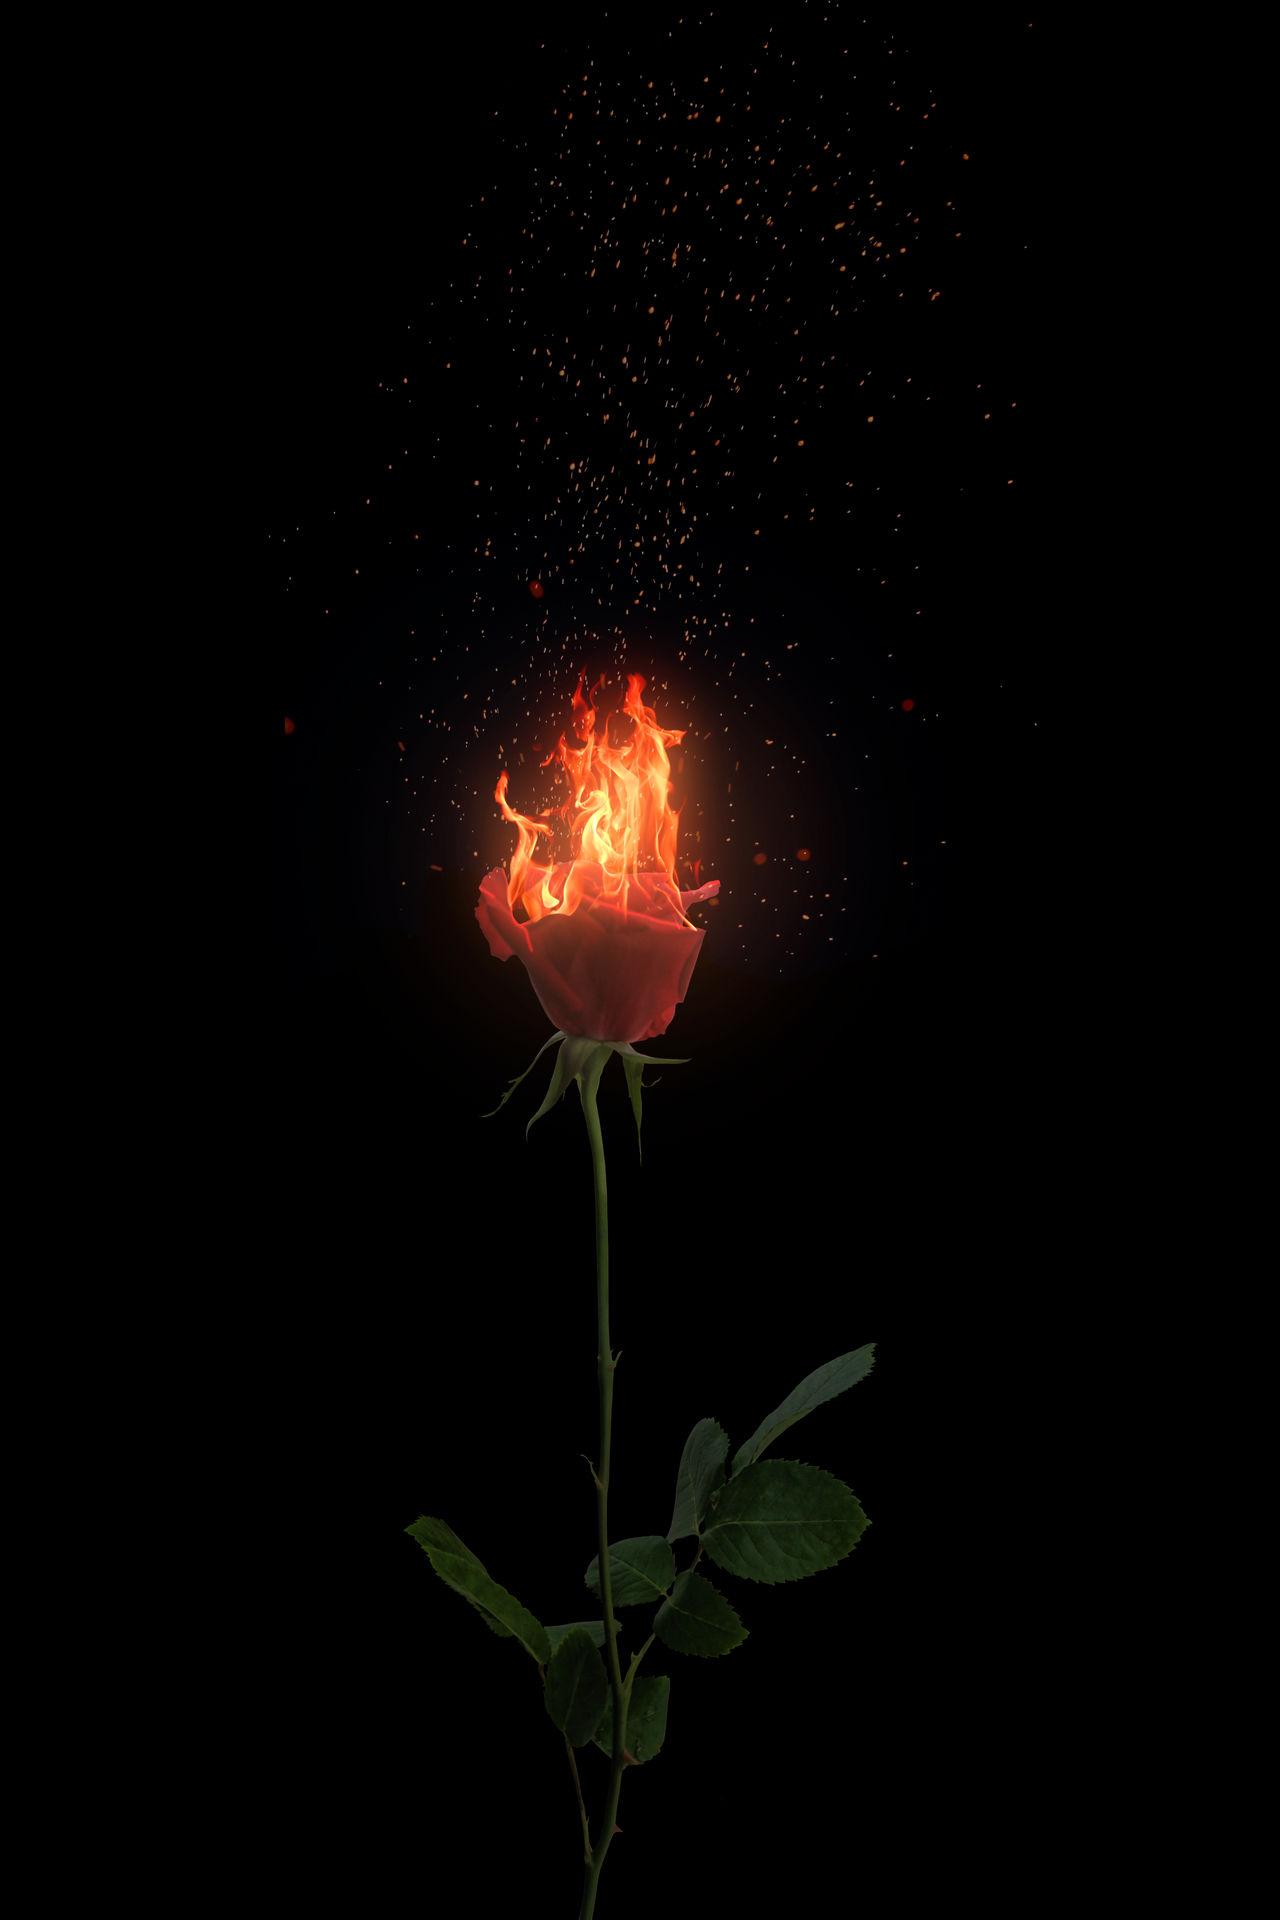 Watching it burn